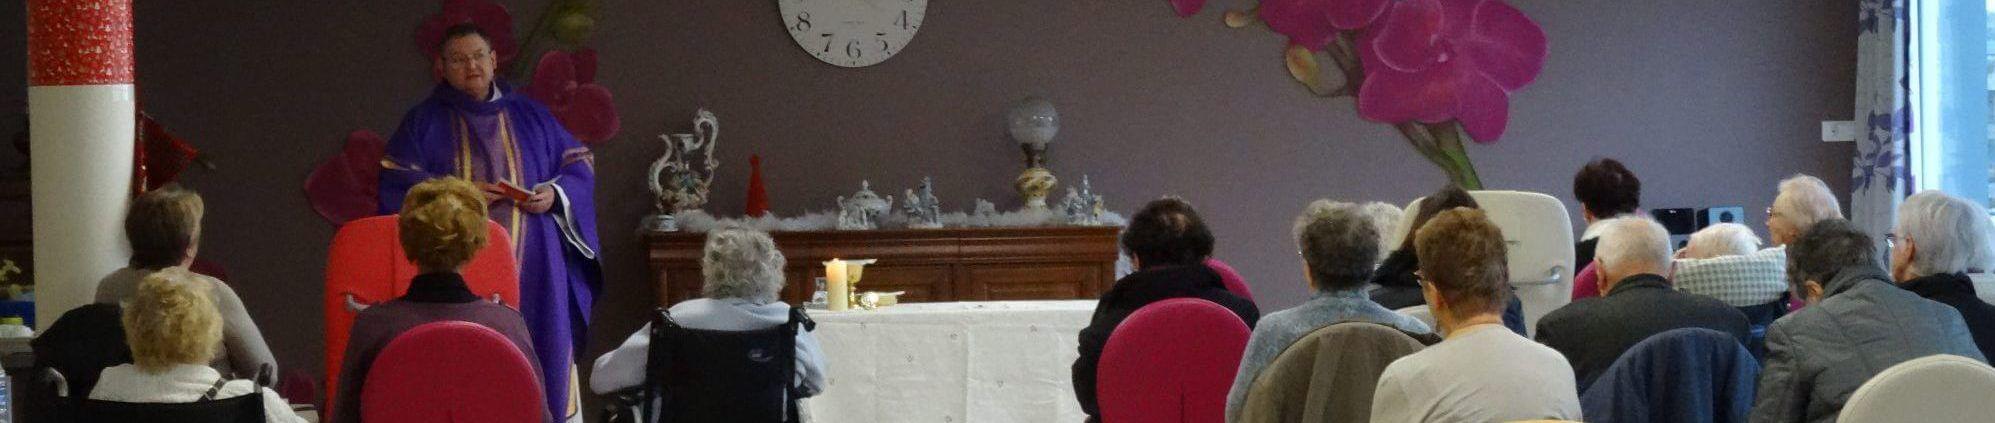 service-religieux-ehpad-les-lilas